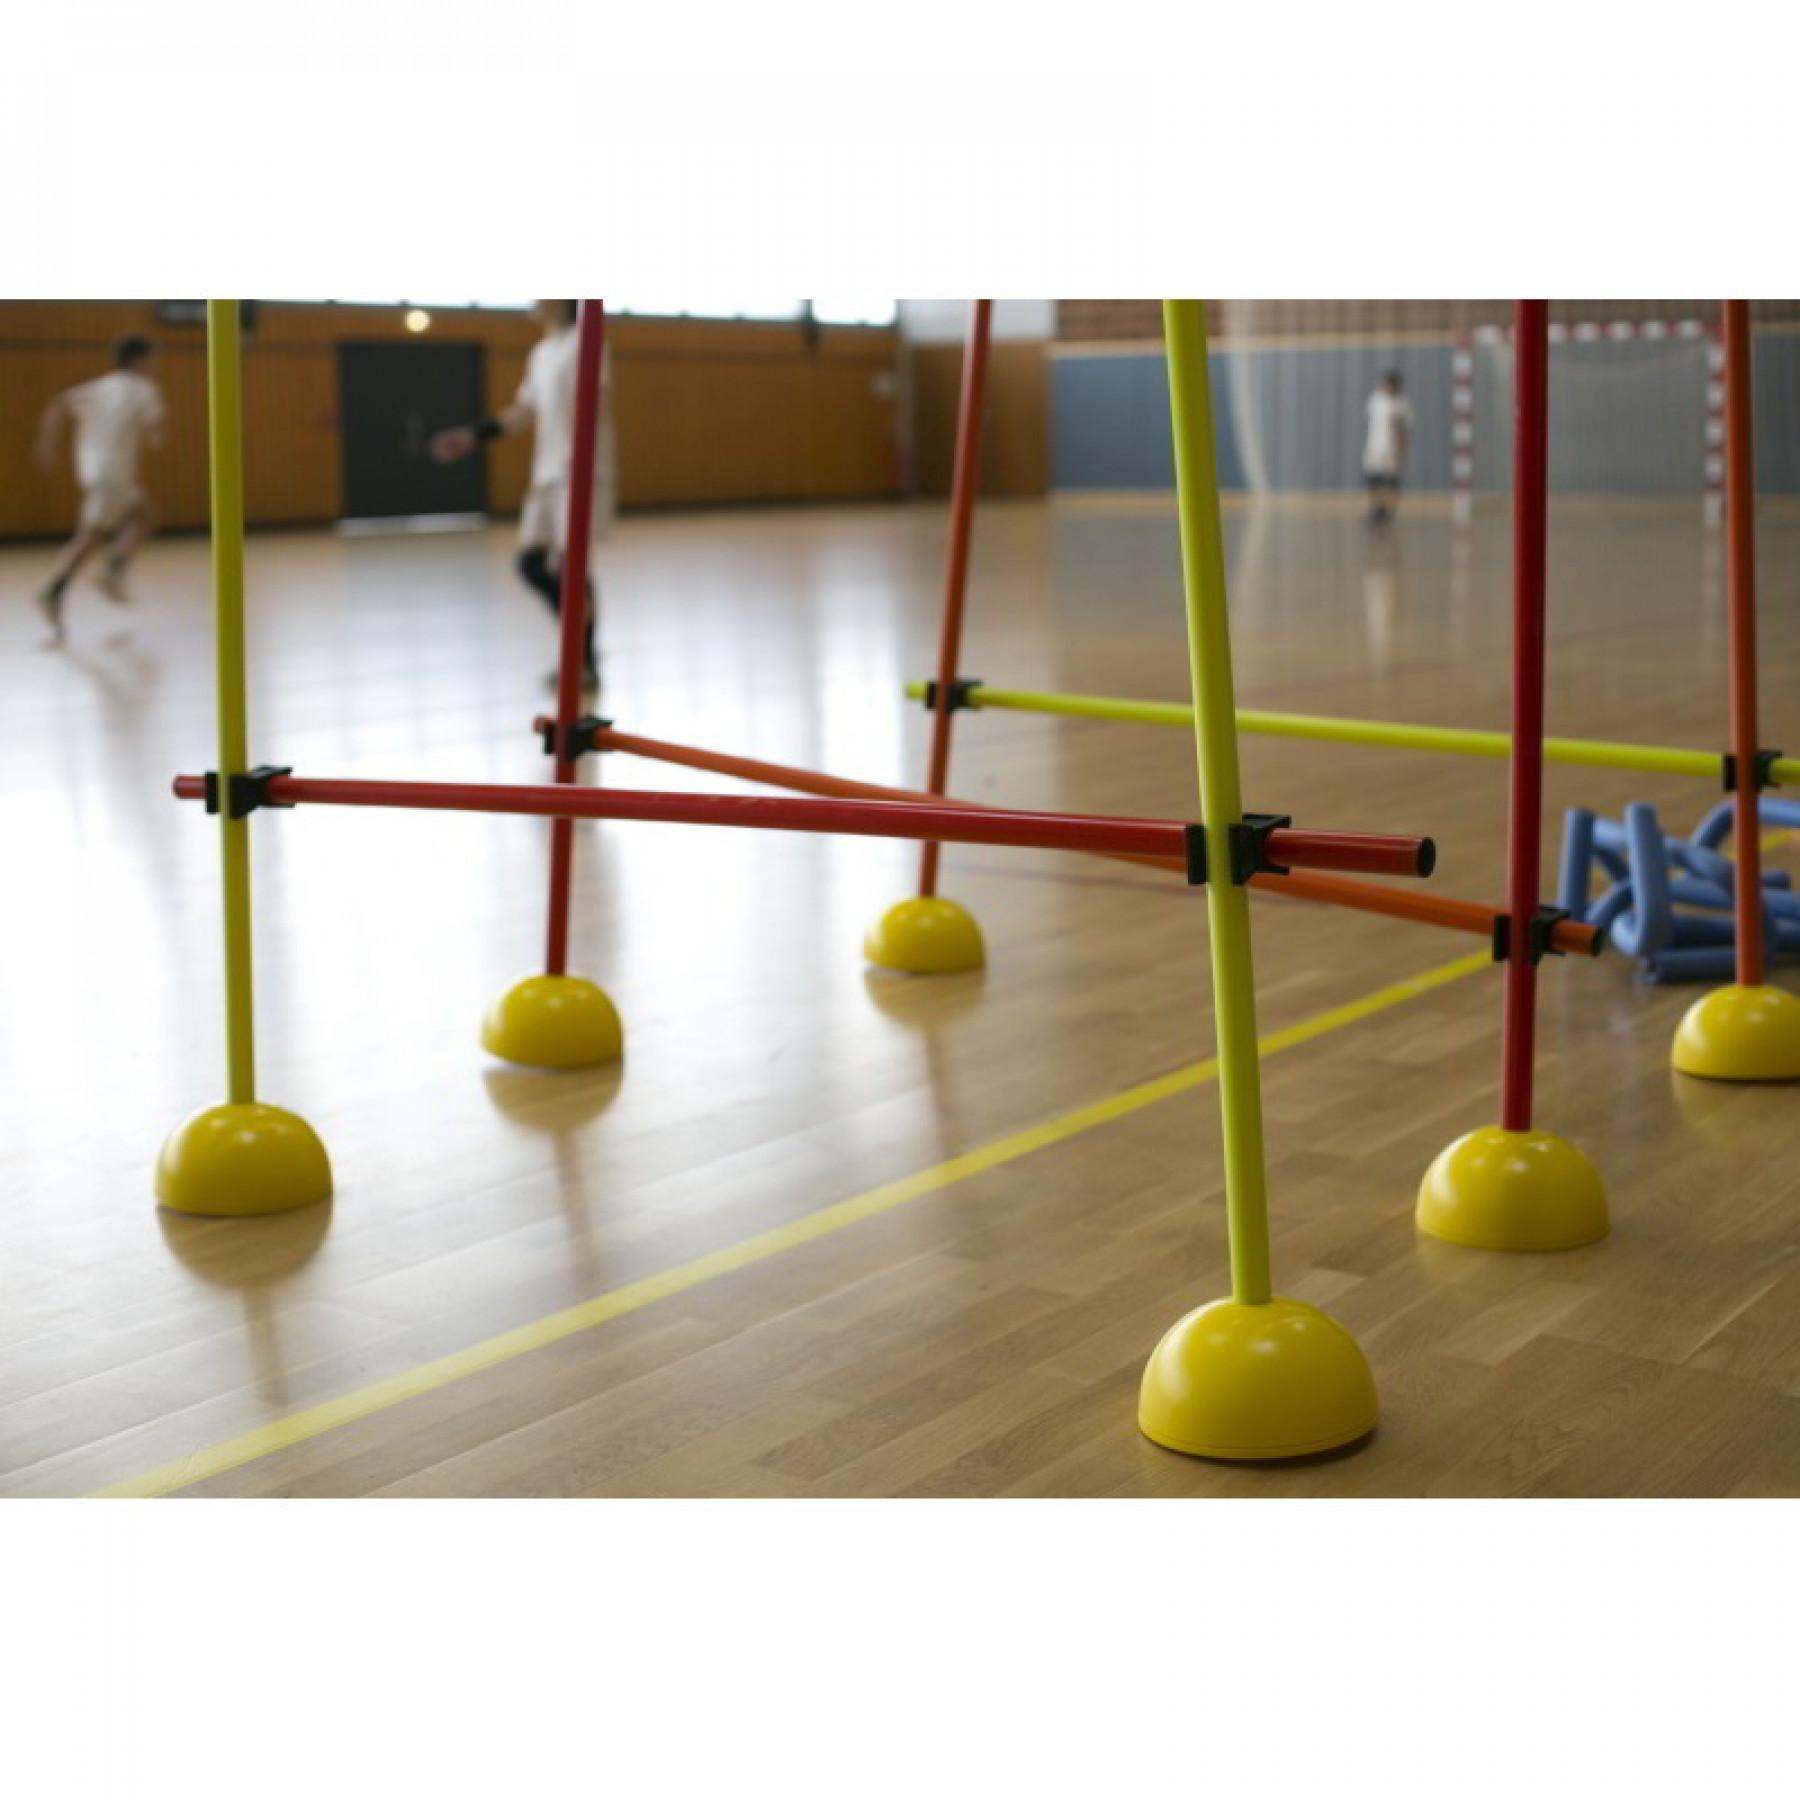 Power Shot Indoor Training Kit